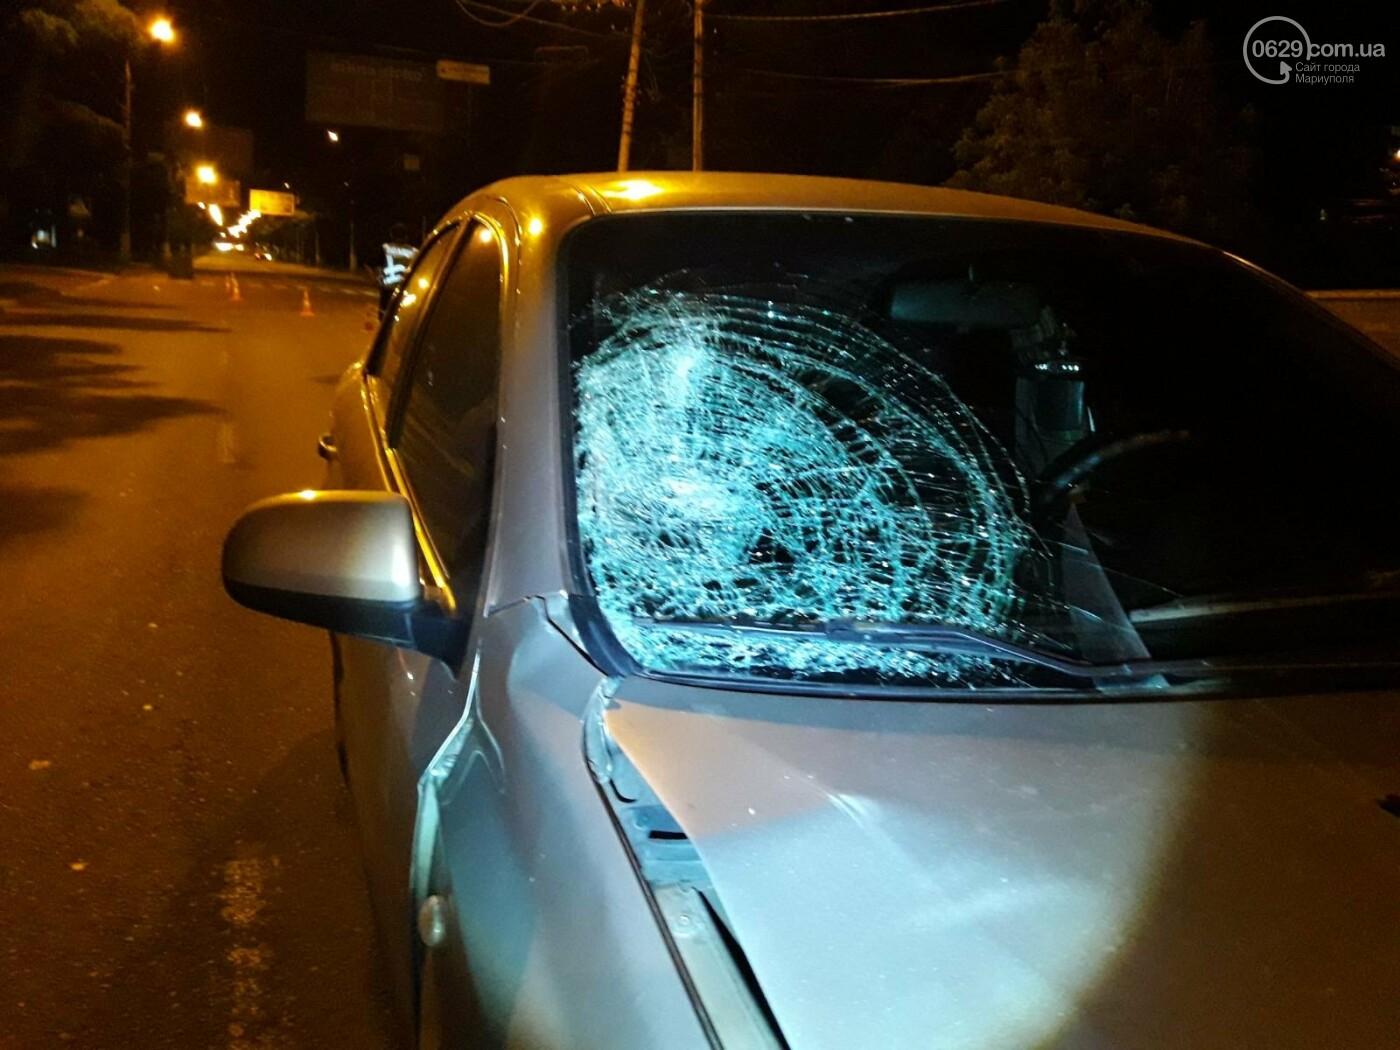 В центре Мариуполя на «зебре» Chevrolet сбил девушку, - ФОТО, ВИДЕО, фото-4